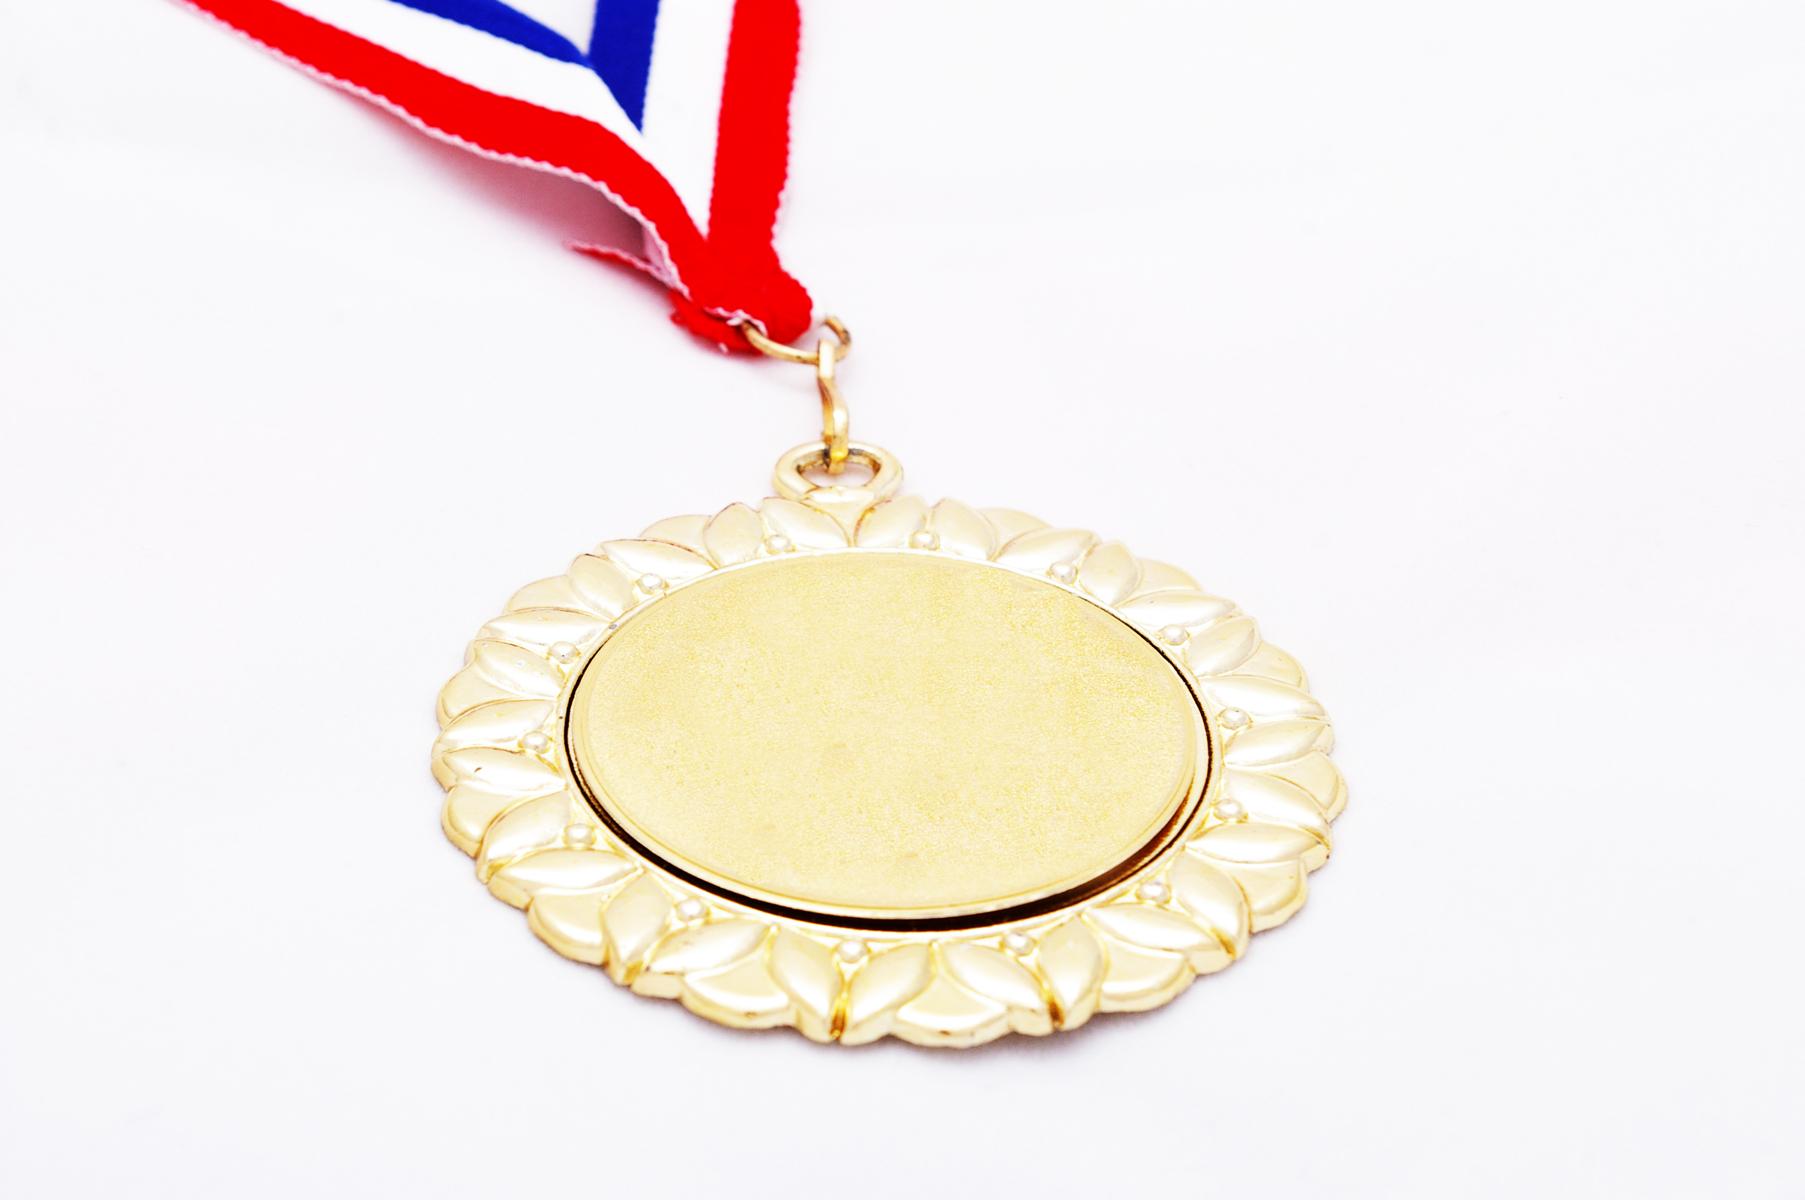 Gold medal, Best, Victory, Taekwondo, Sport, HQ Photo